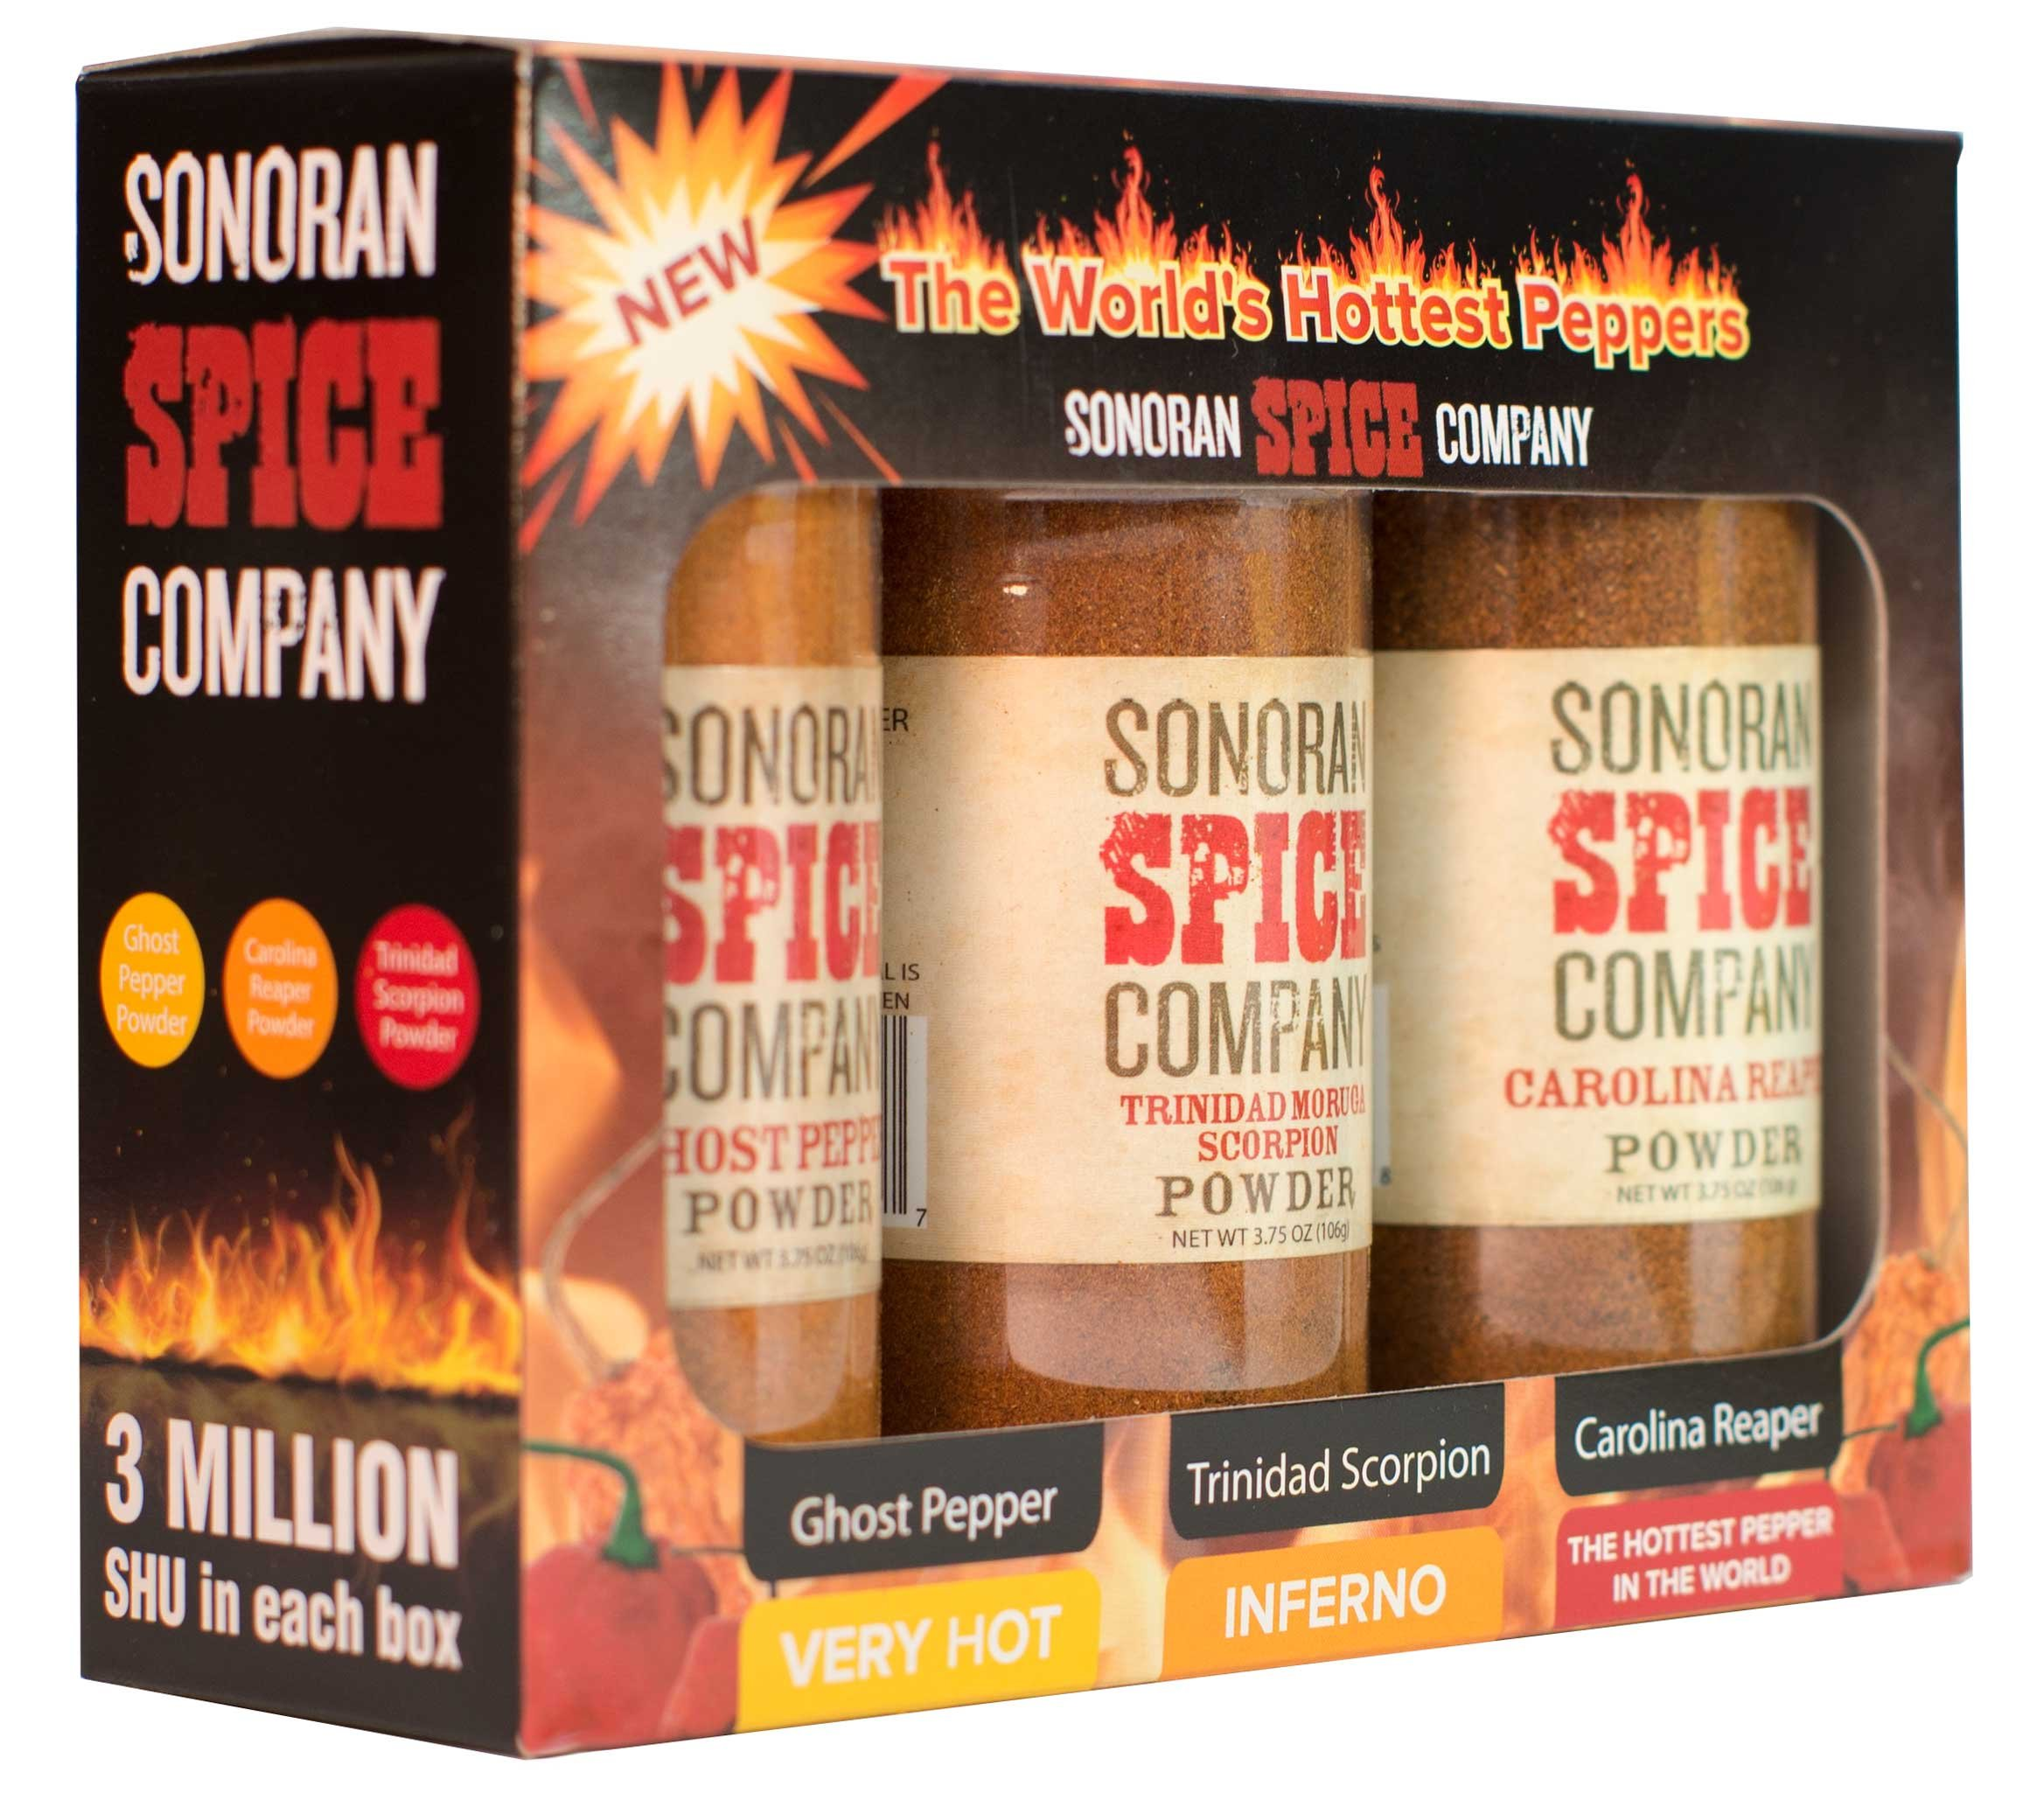 Carolina Reaper, Trinidad Scorpion, Ghost Pepper 3.75 Oz Powder Gift Box